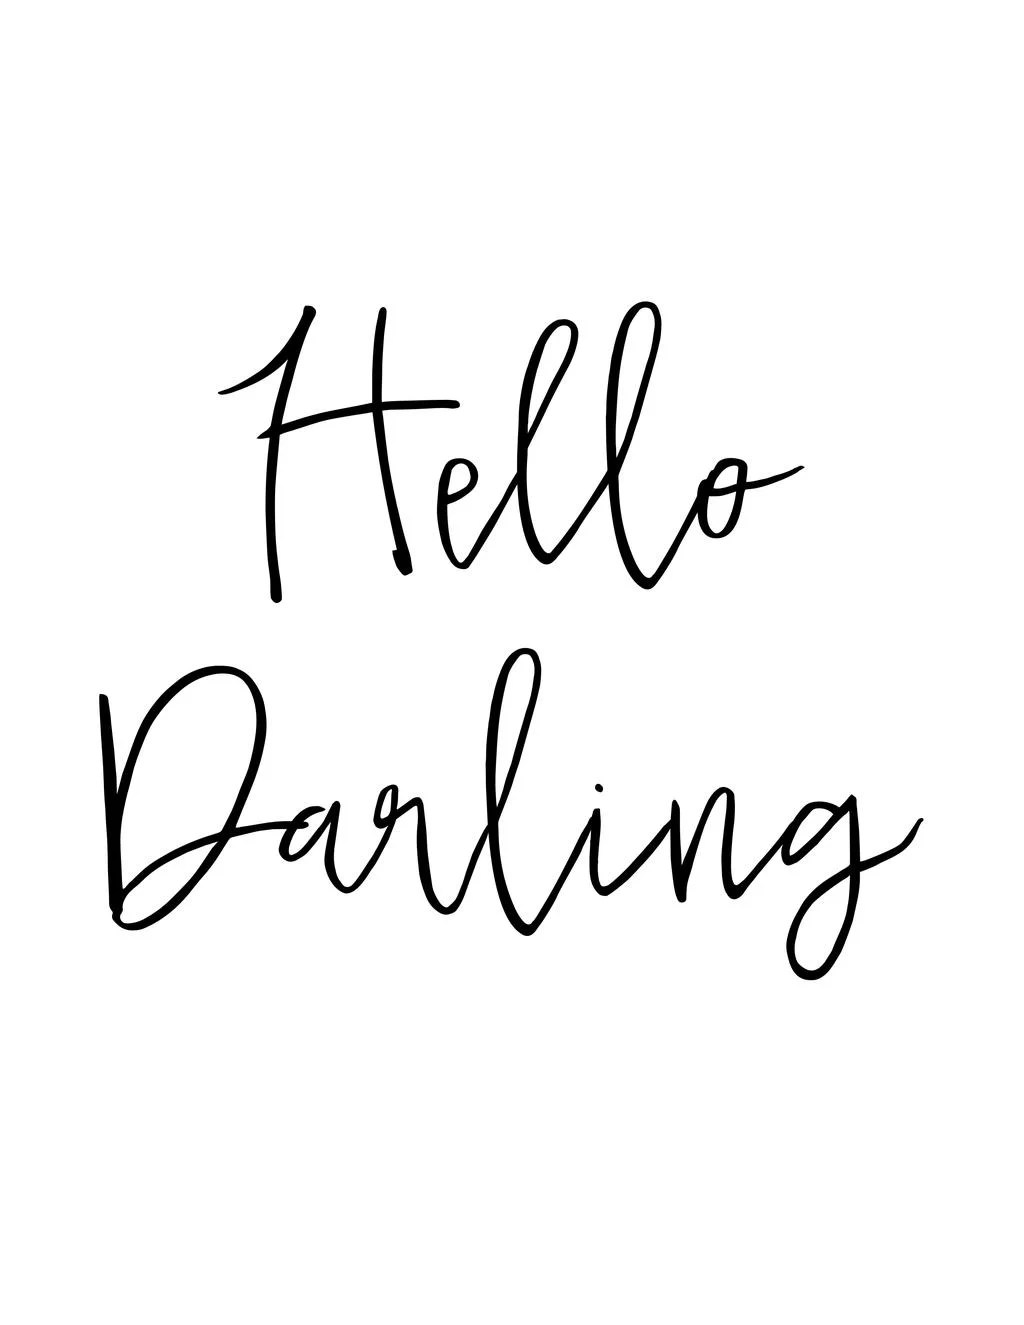 Hello Darling Sign Free Printable